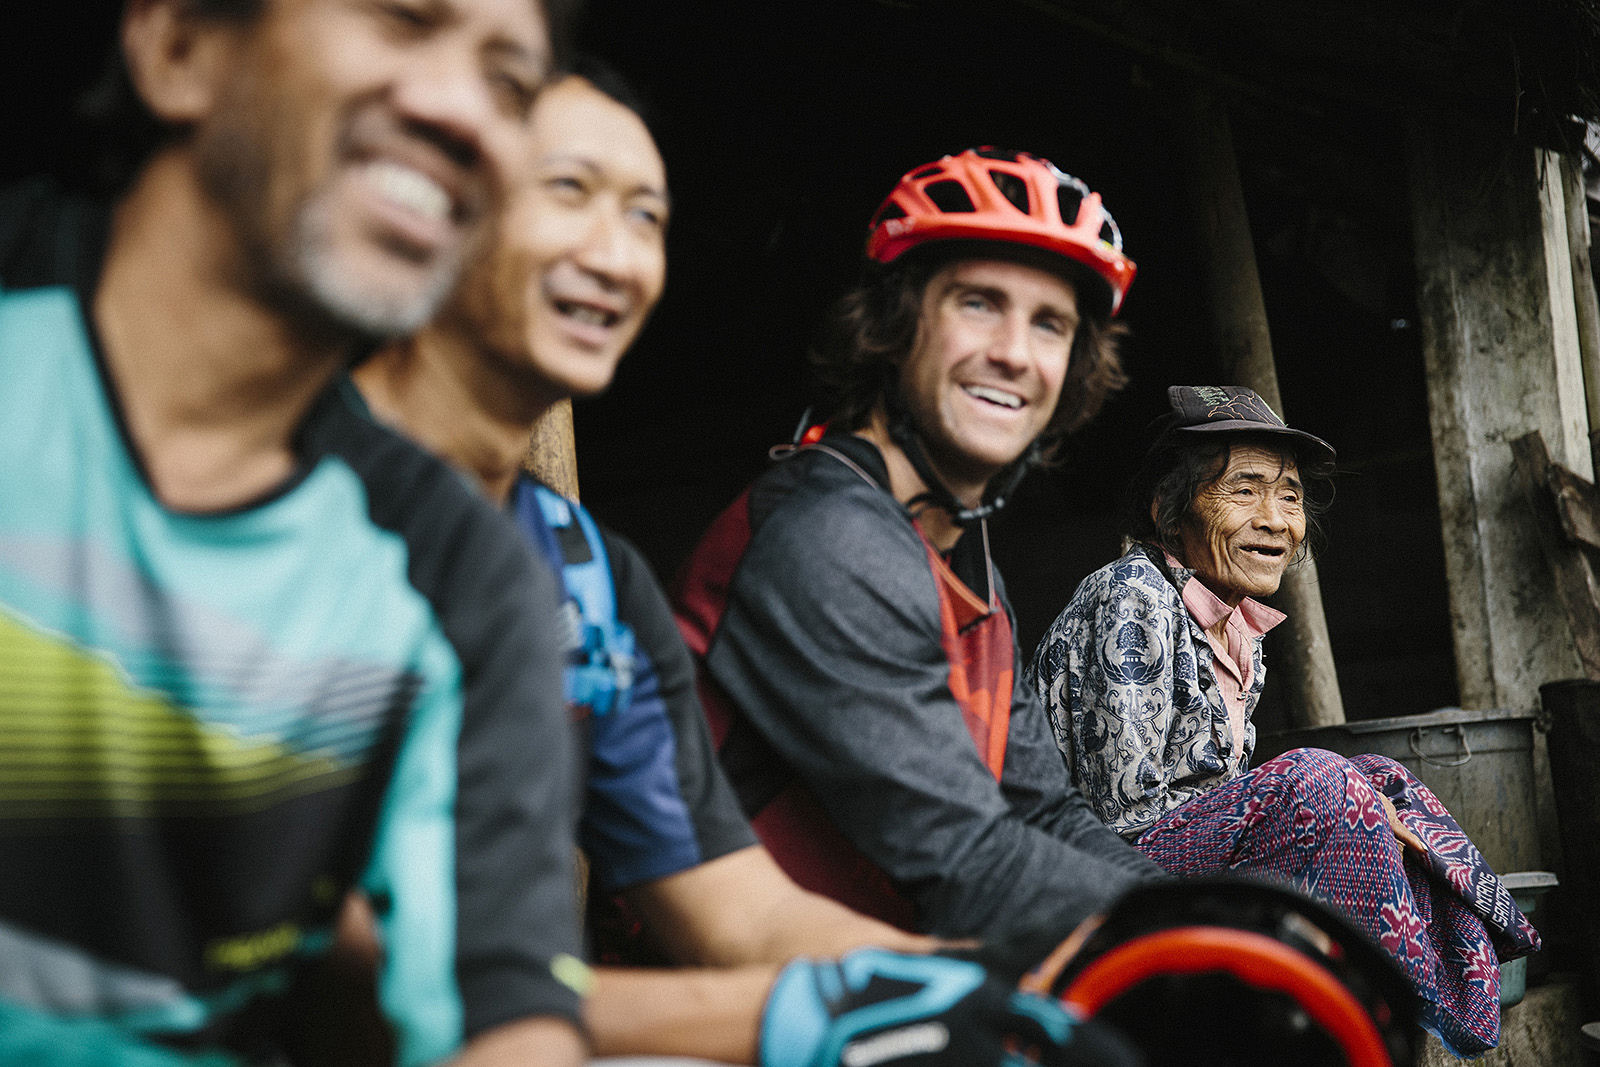 Cam McCaul with Chandra Ariavijaya and Rahmat Saefudin in Bali Indonesia